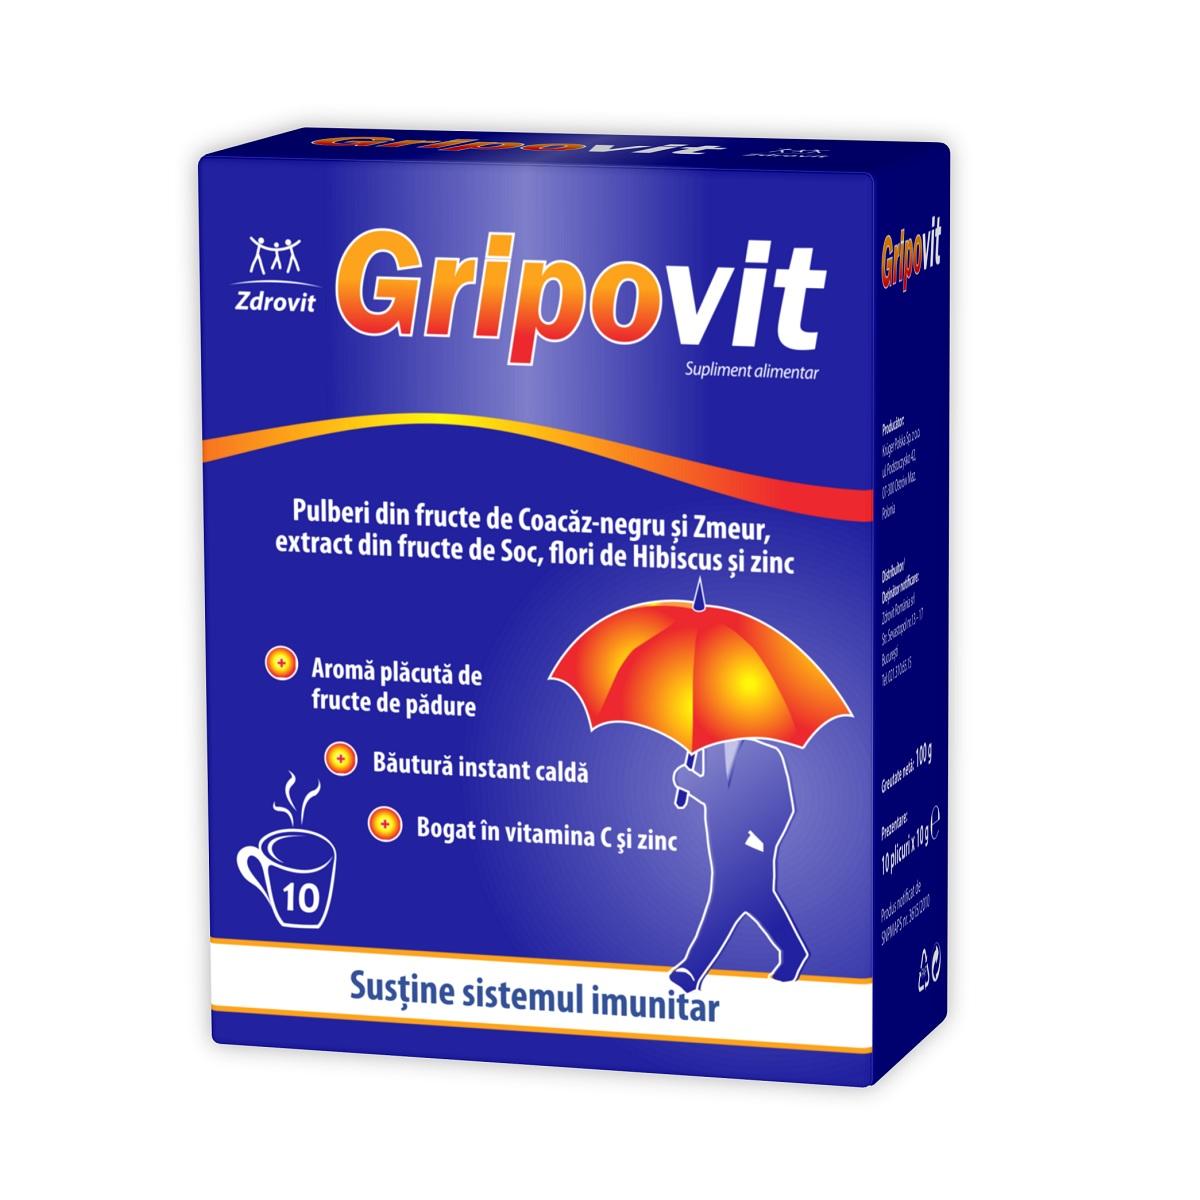 Gripovit, 10 plicuri, Zdrovit drmax poza